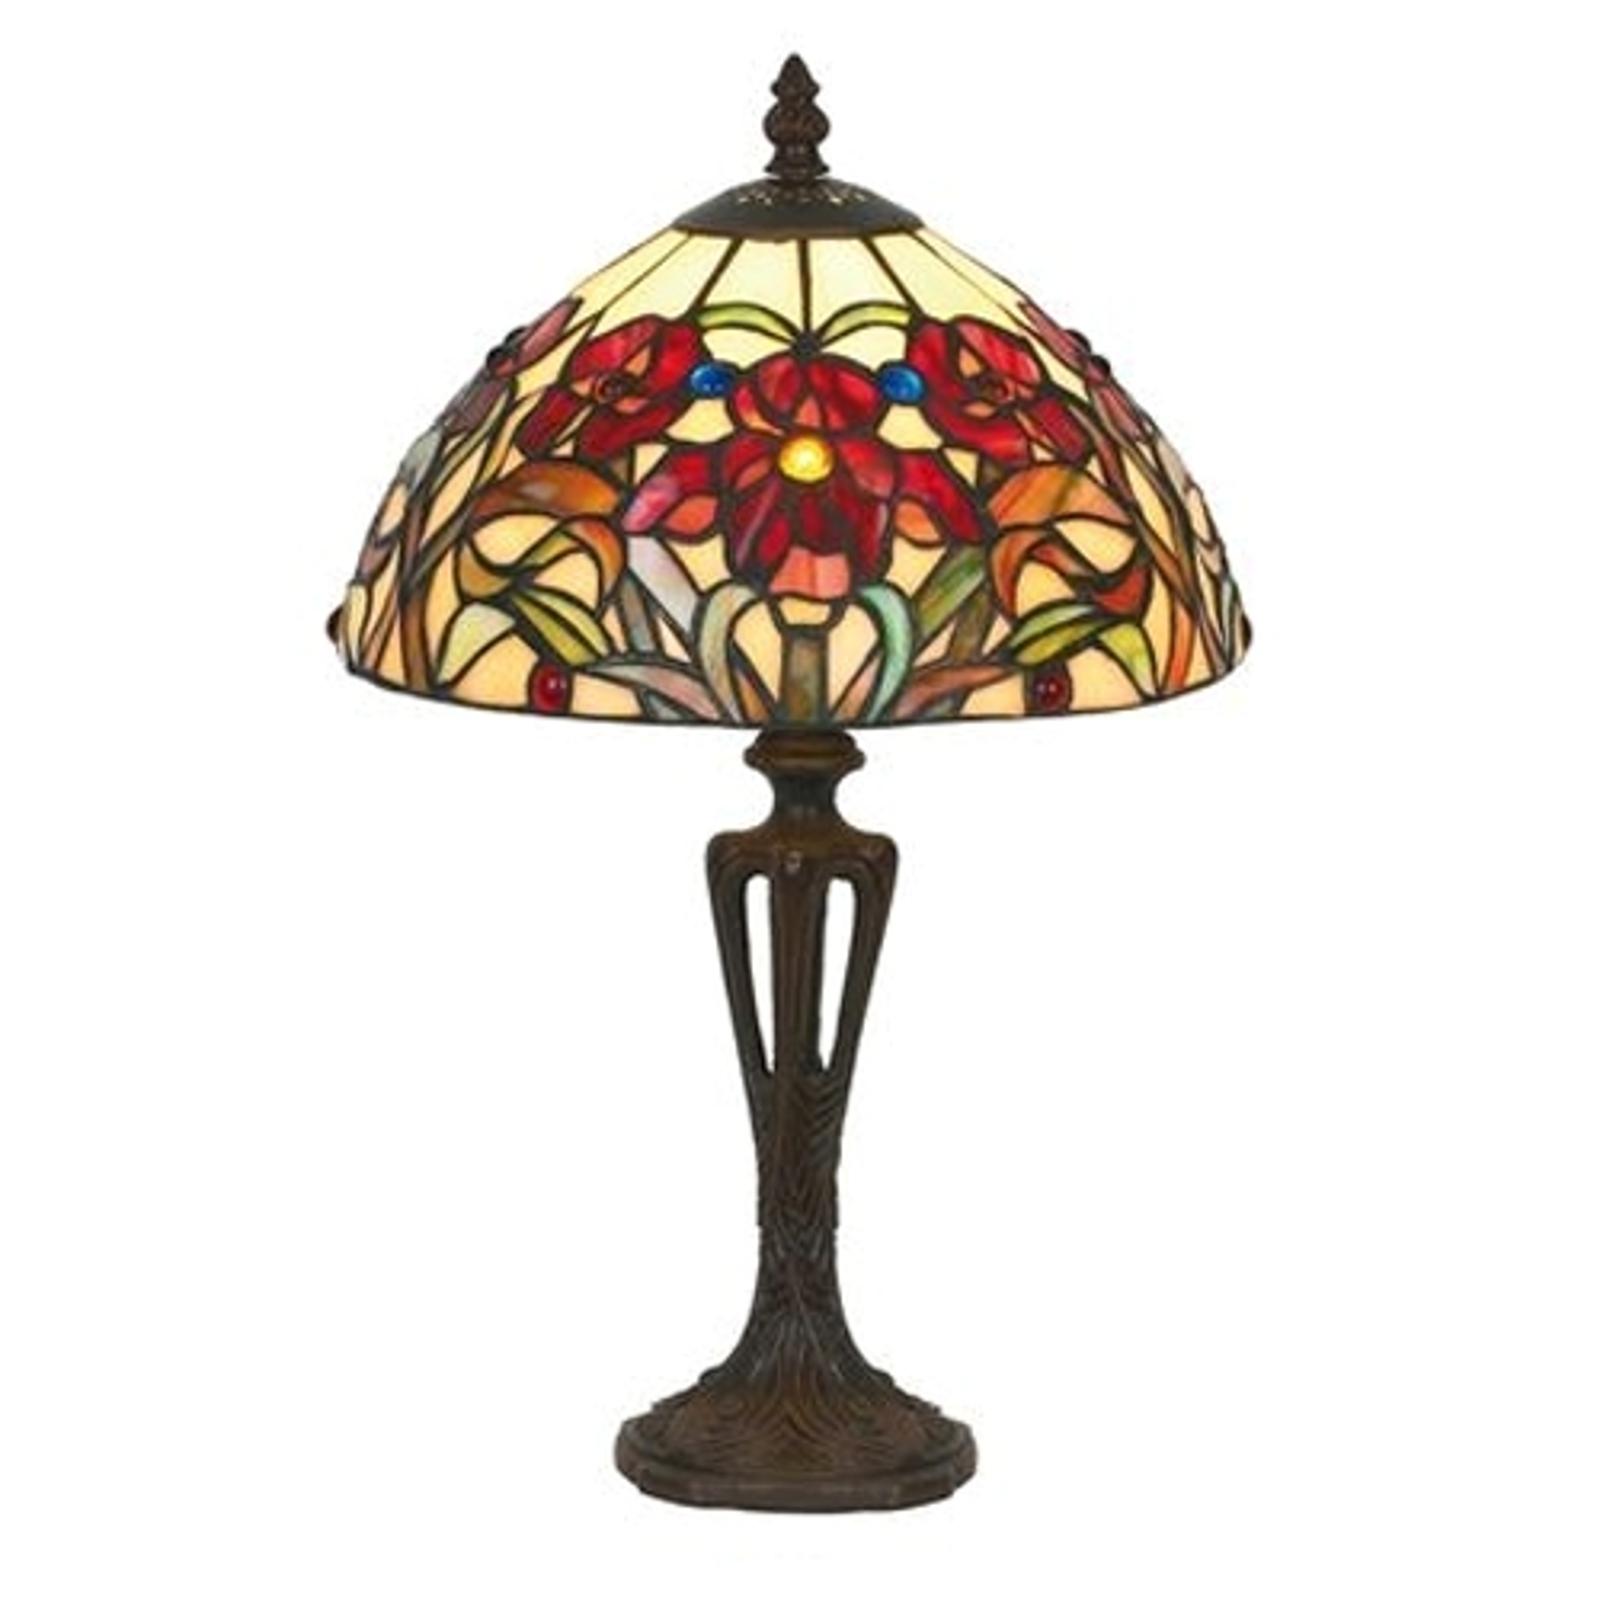 Klassisk ELINE bordlampe i Tiffany-stil på 40 cm